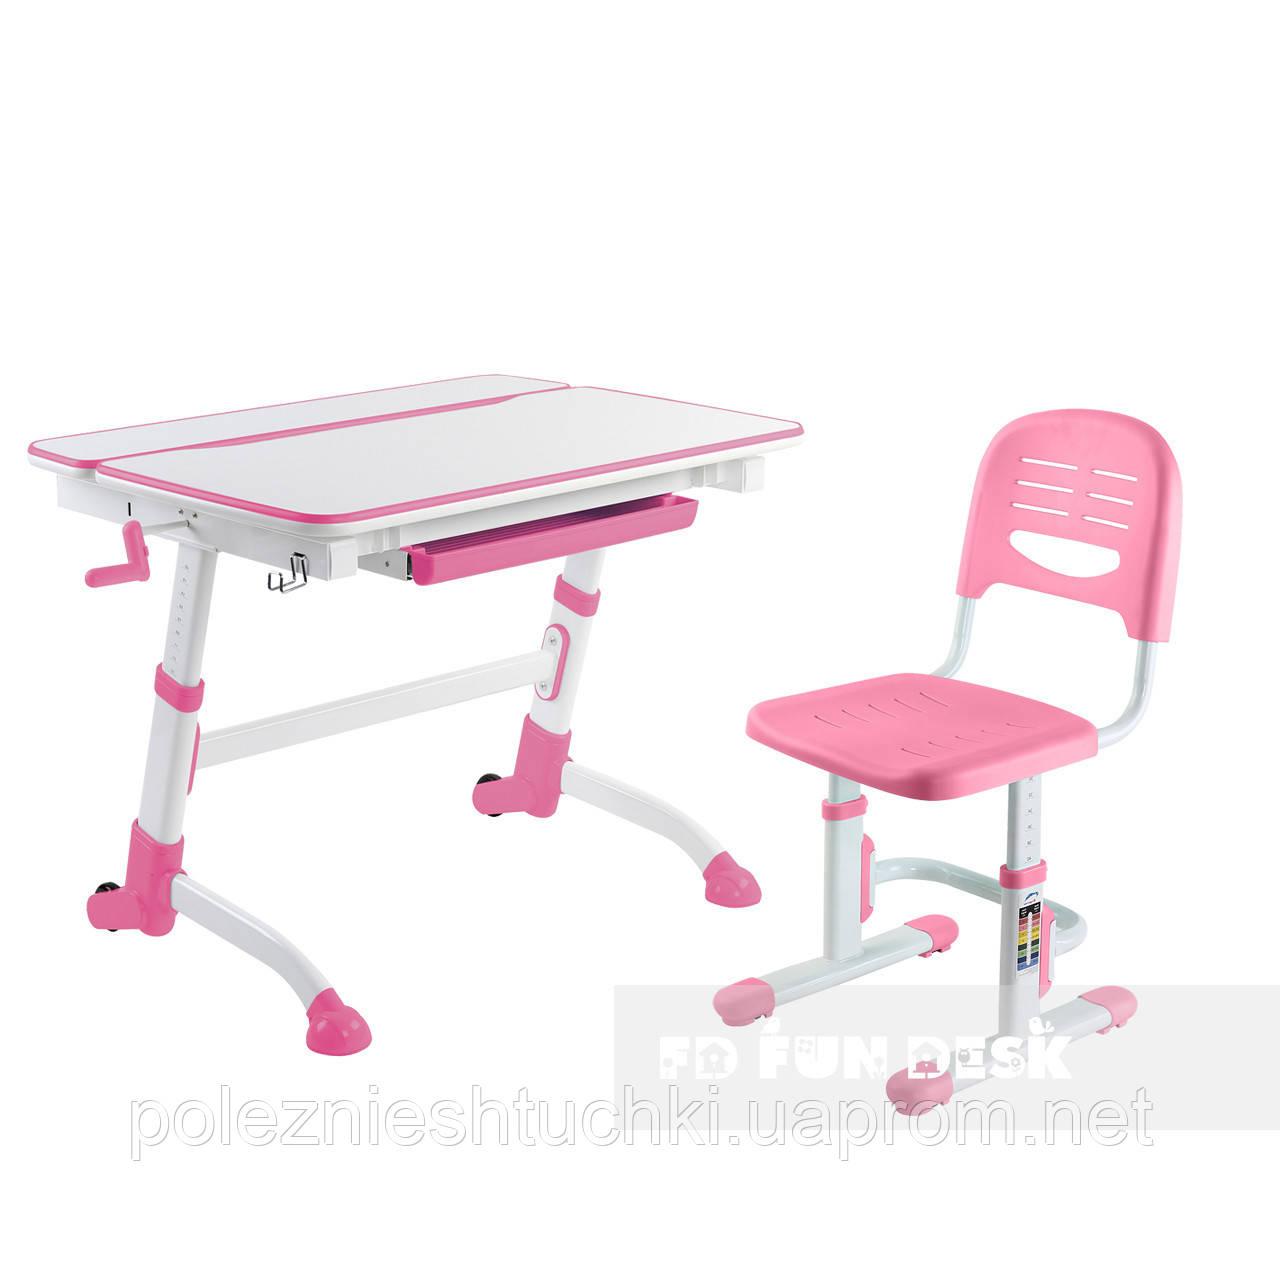 Растущая парта-трансформер FunDesk Volare Pink+ Детский стул SST3 Pink